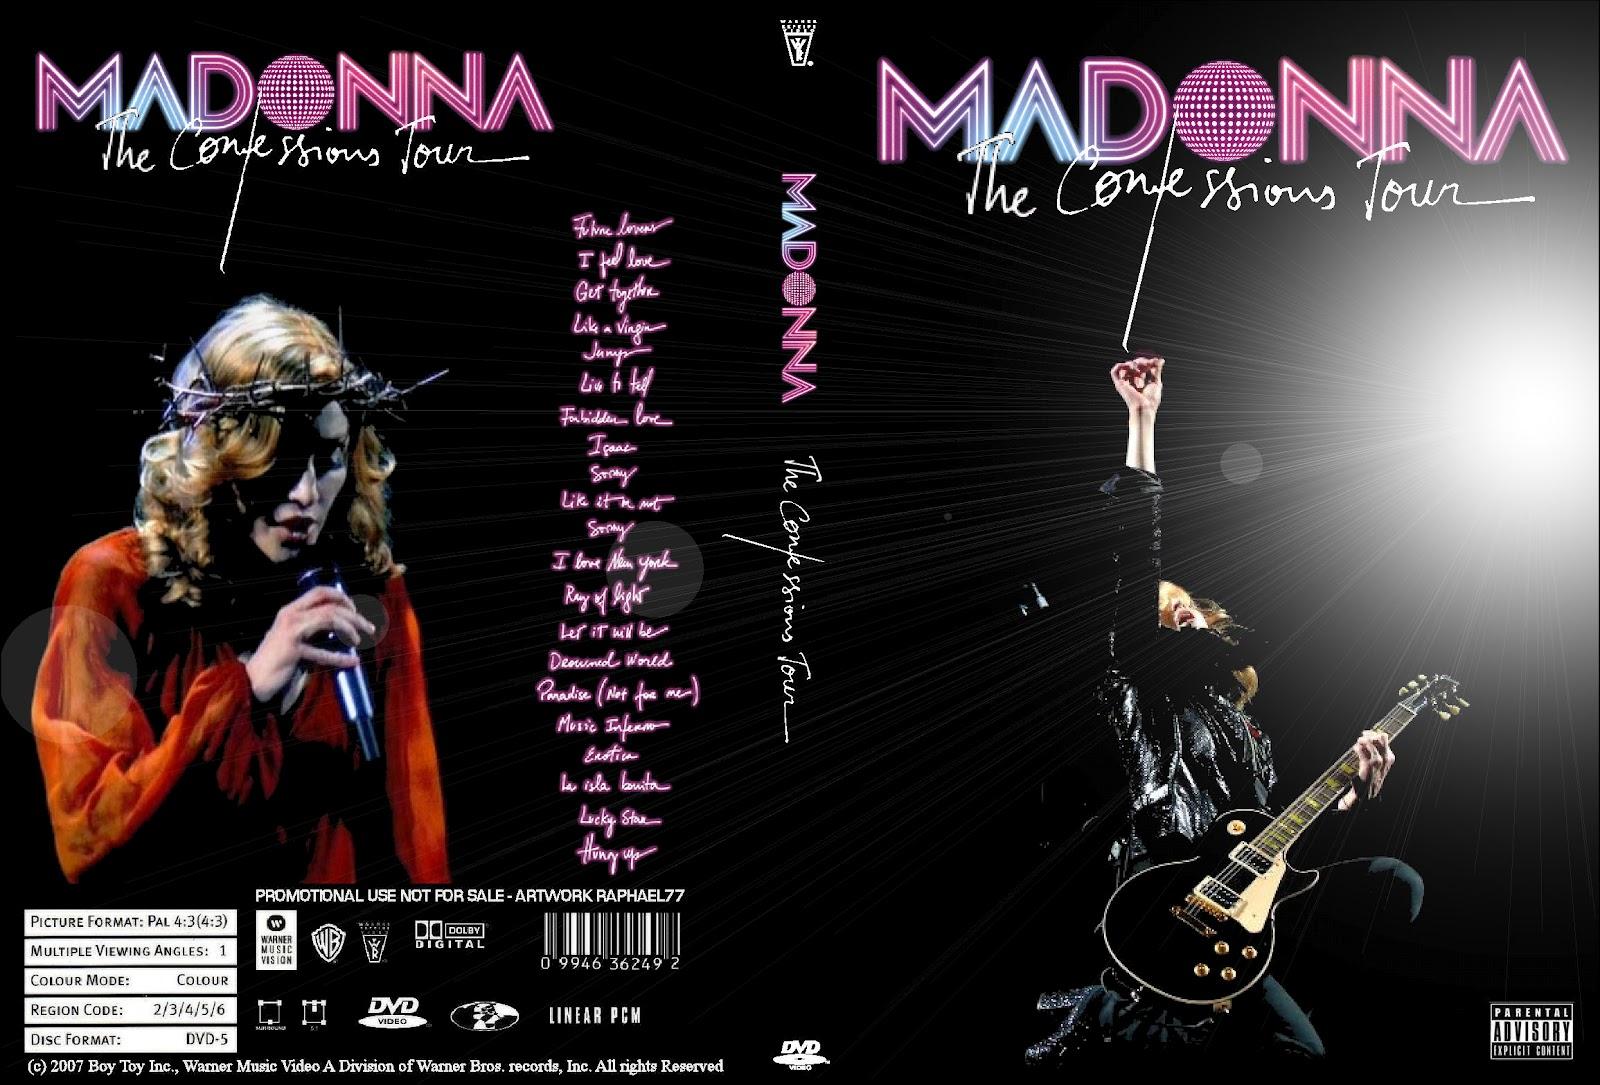 madonna confessions tour poster - photo #28